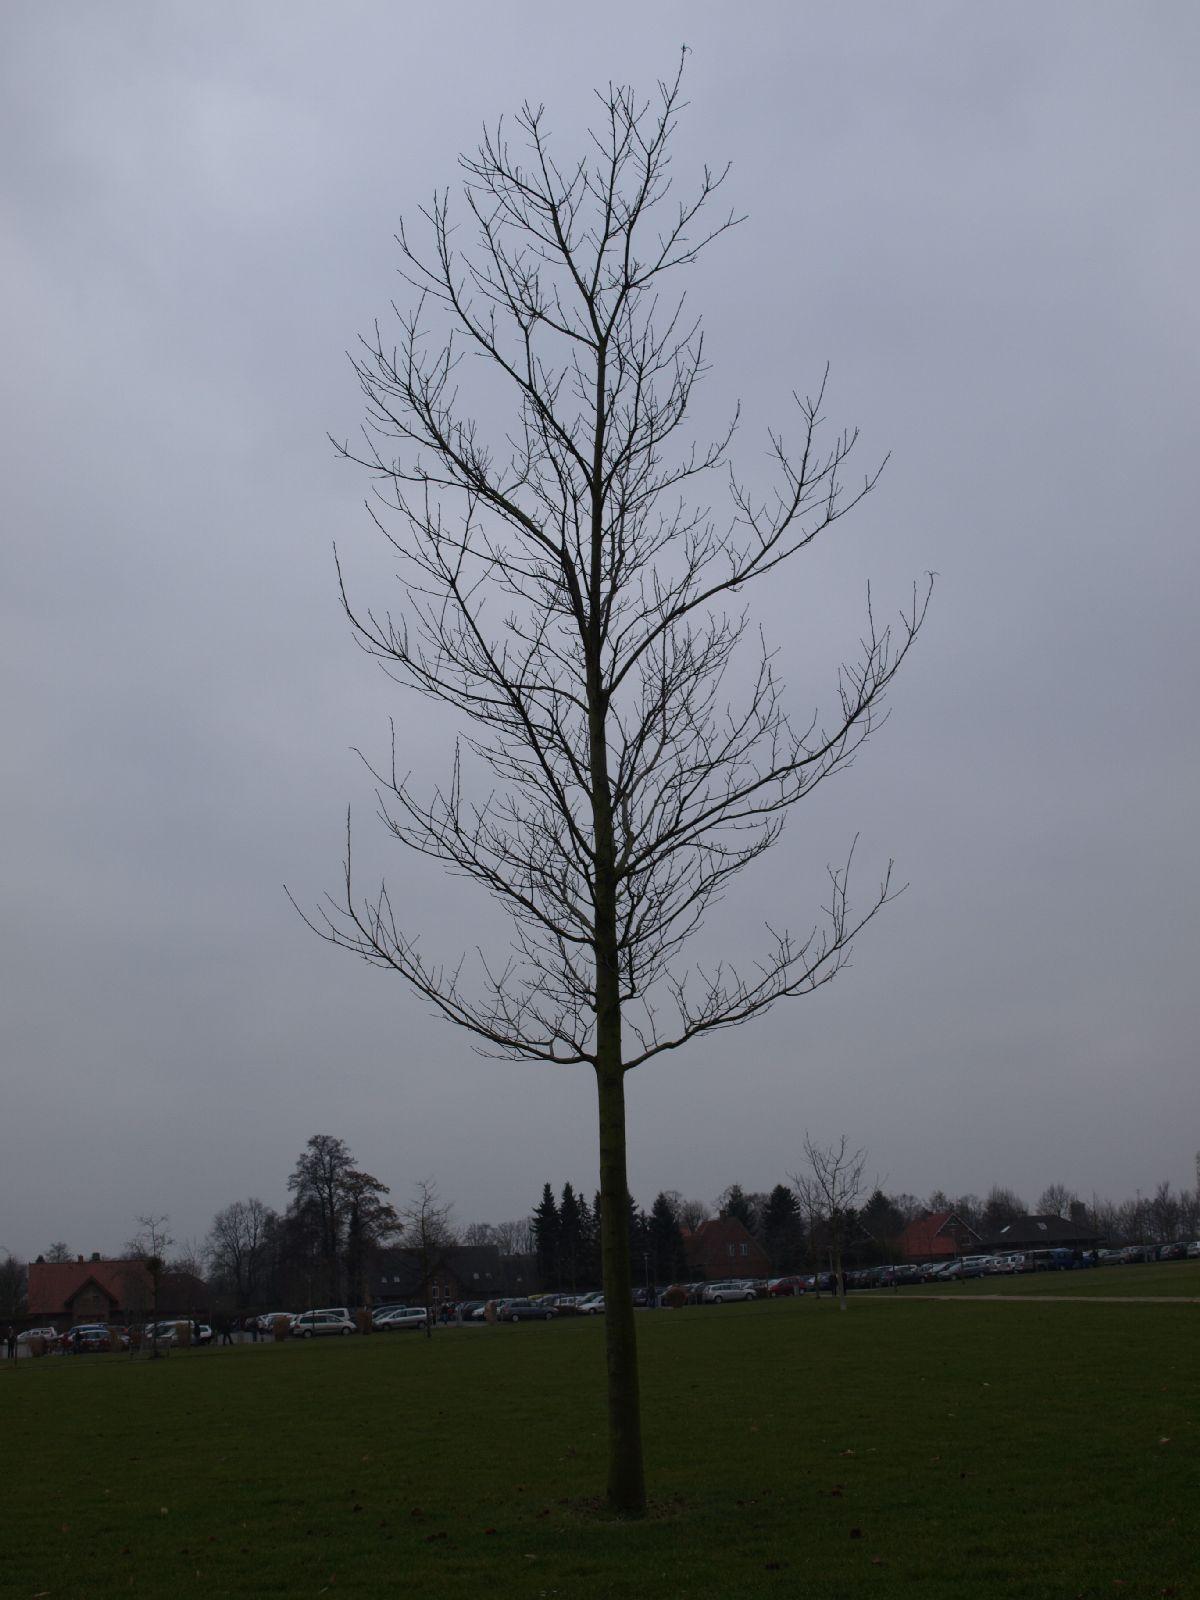 Pflanzen-Baum-Silhouette-Foto_Textur_B_P3011031